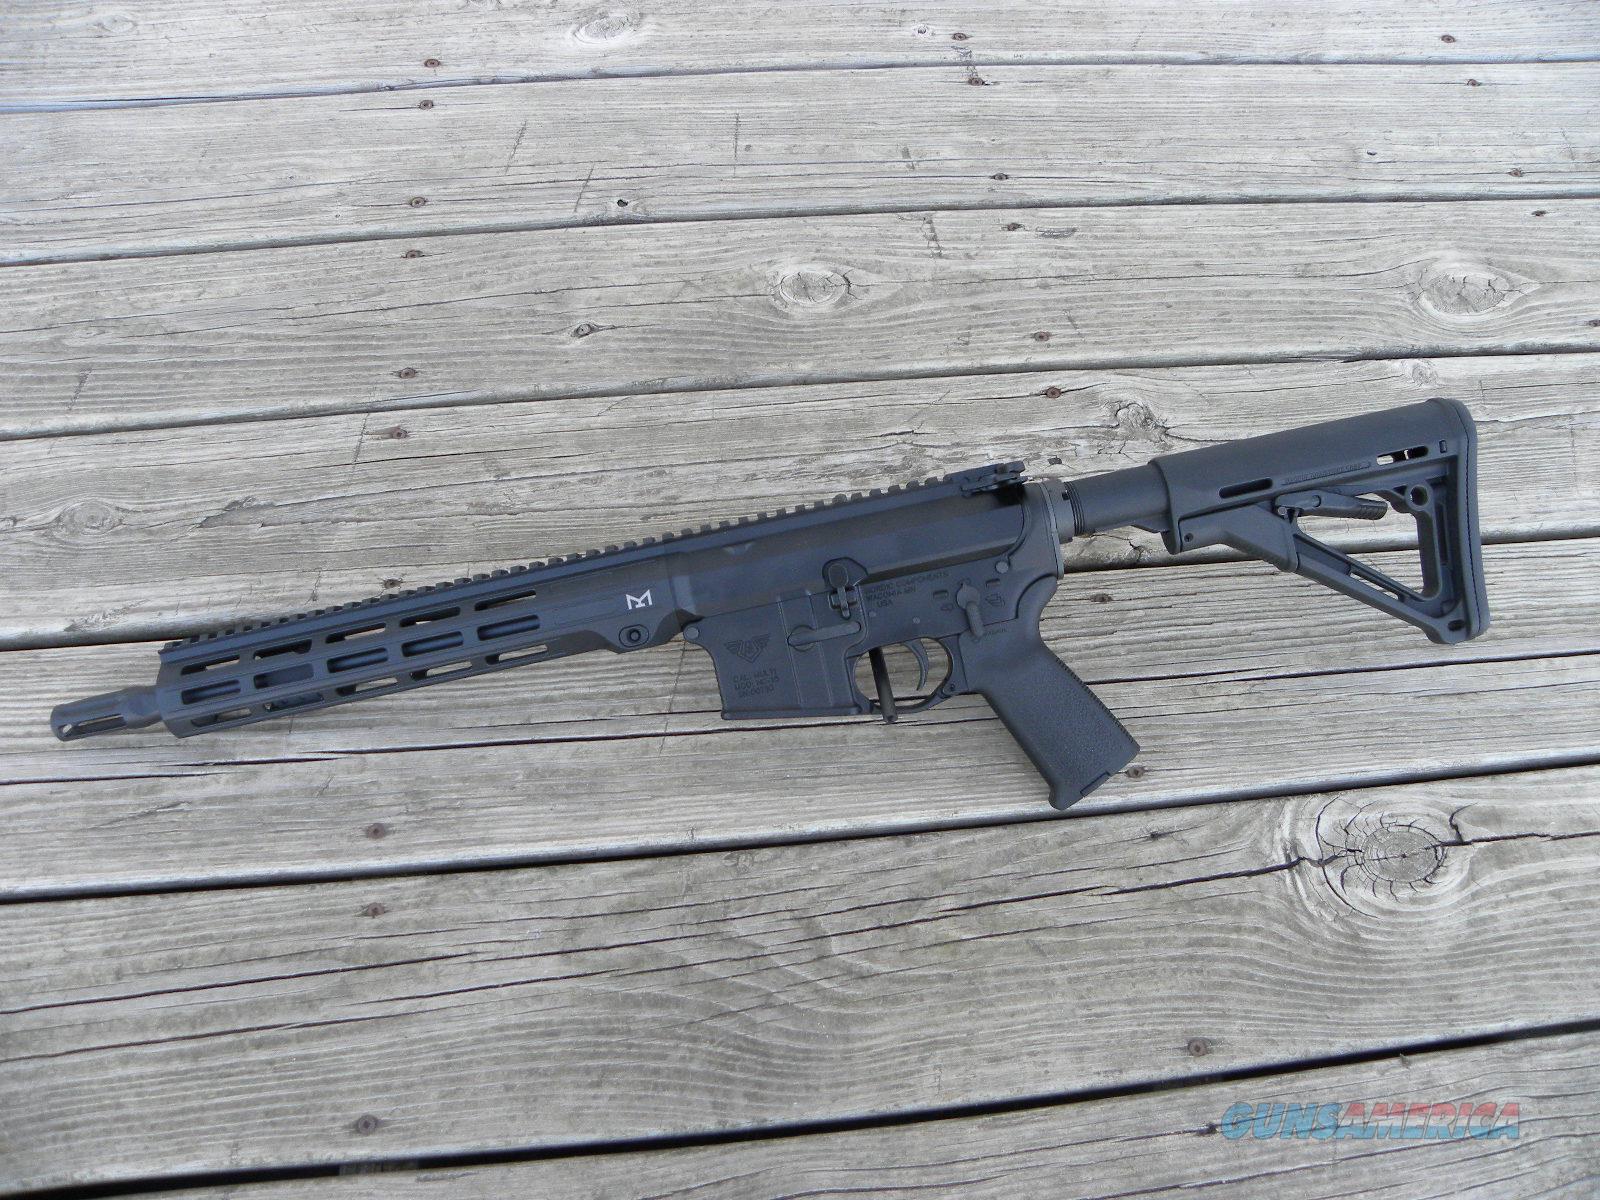 "Nordic Components NC15 SBR 11.5"" MLOK  Guns > Rifles > MN Misc Rifles"